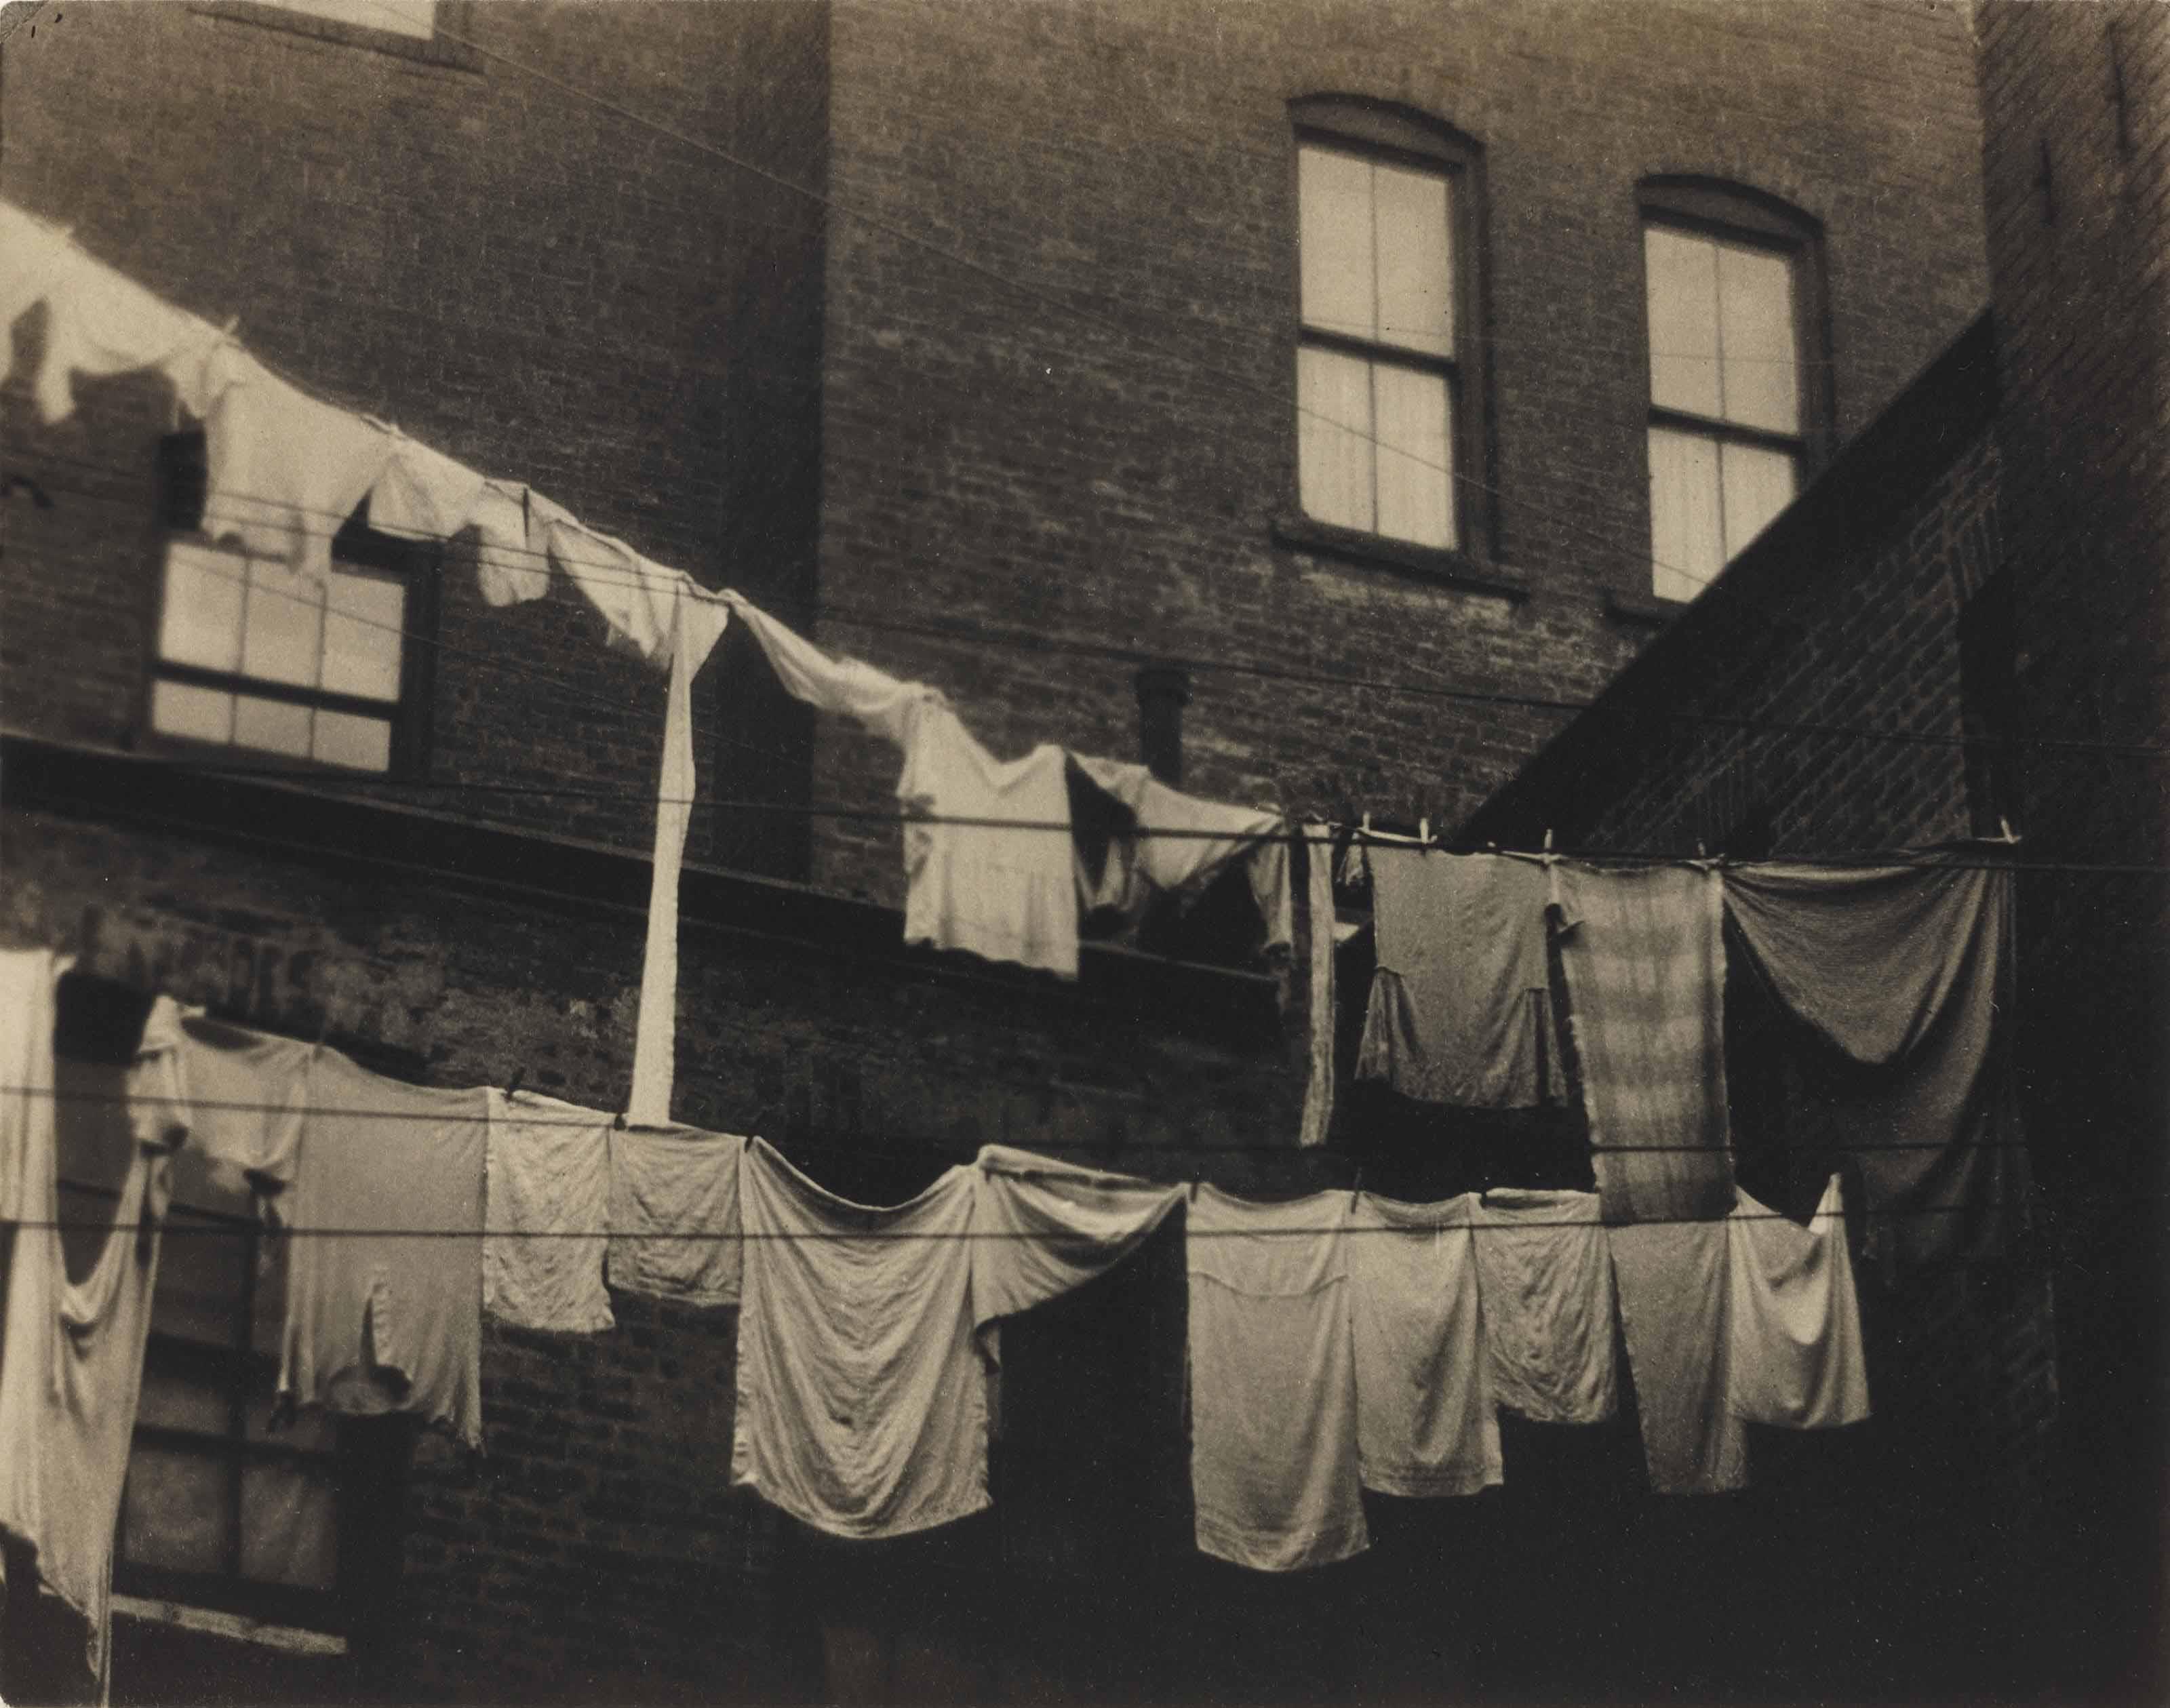 Clothesline, 1924